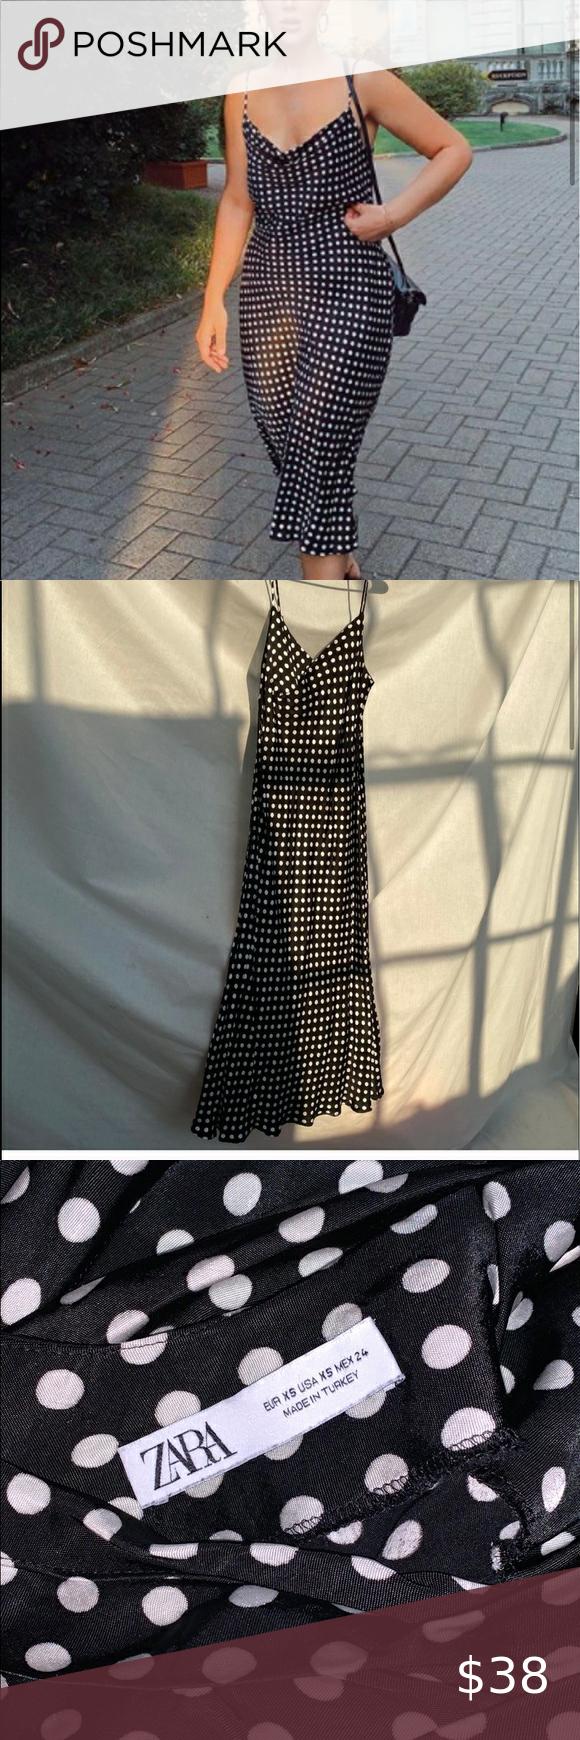 34+ Black and white dot dress zara trends